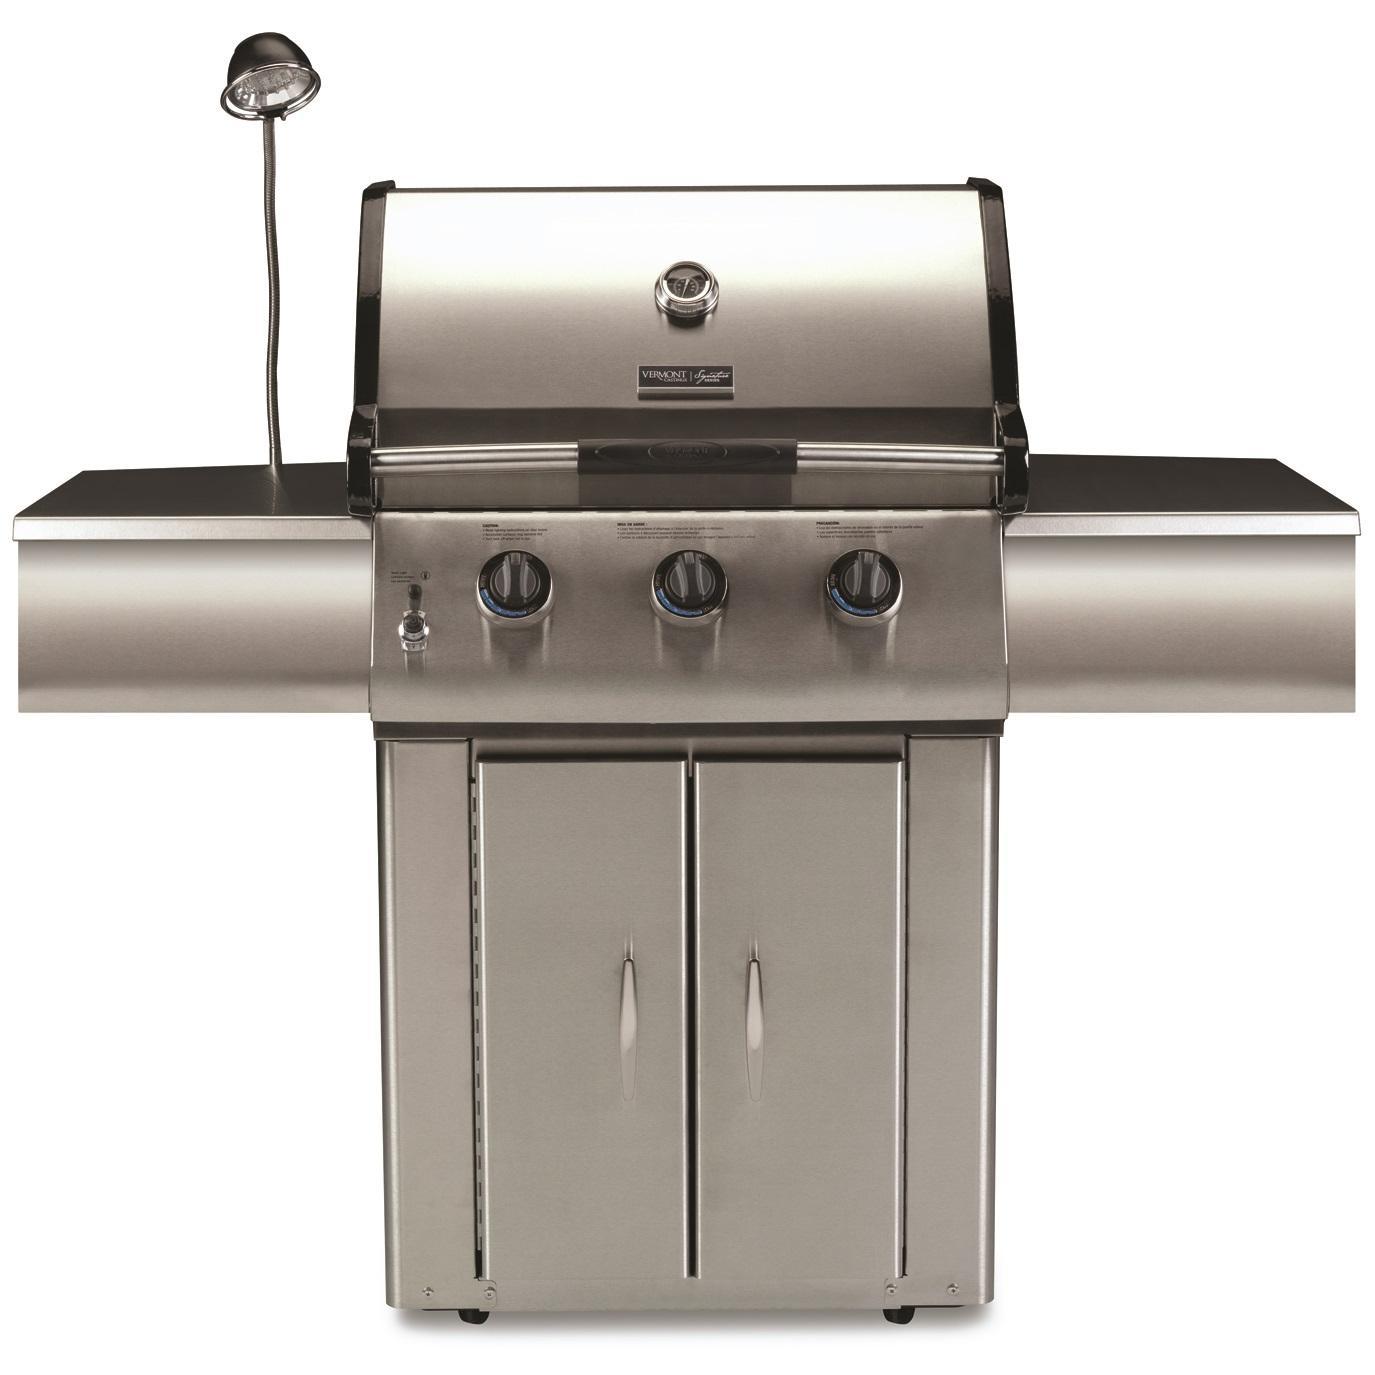 vermont castings 3 burner propane gas grill on cart. Black Bedroom Furniture Sets. Home Design Ideas